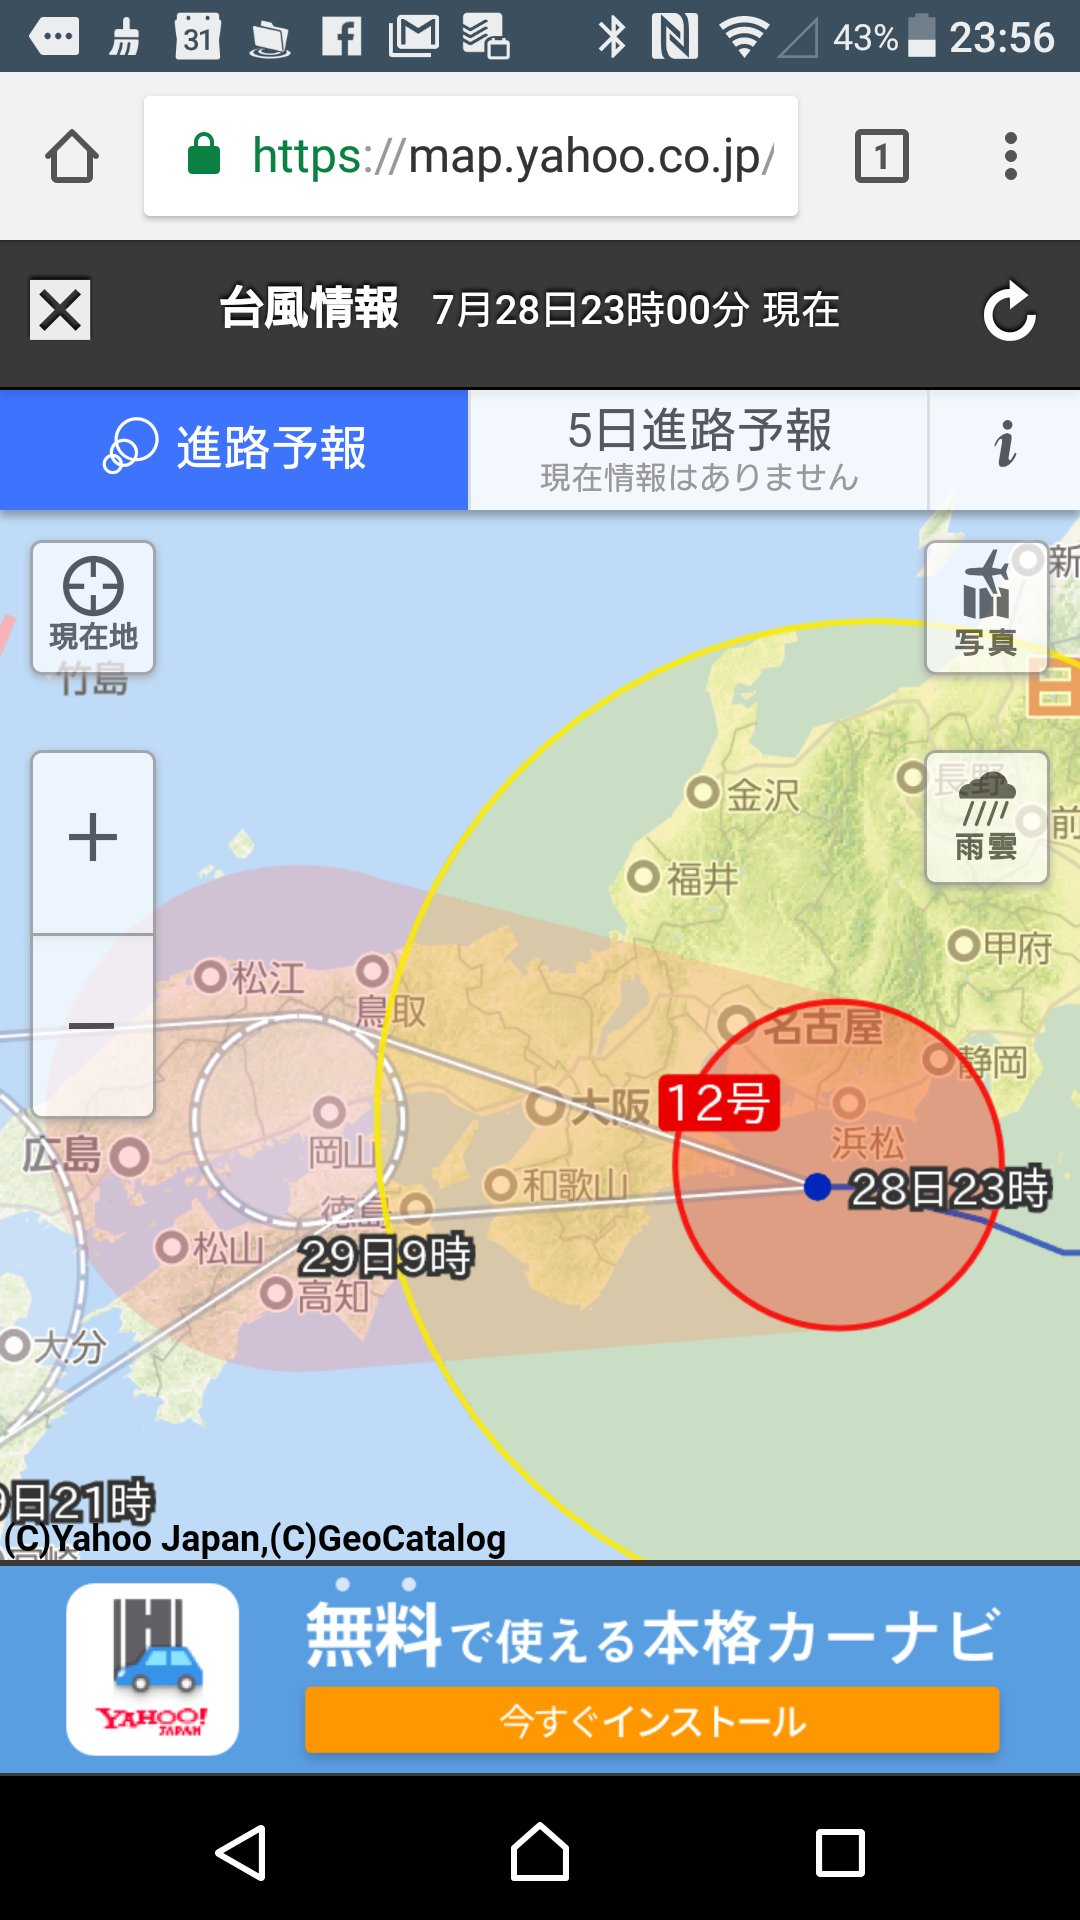 台風12号 🌀 https://t.co/HT6hekpkDW